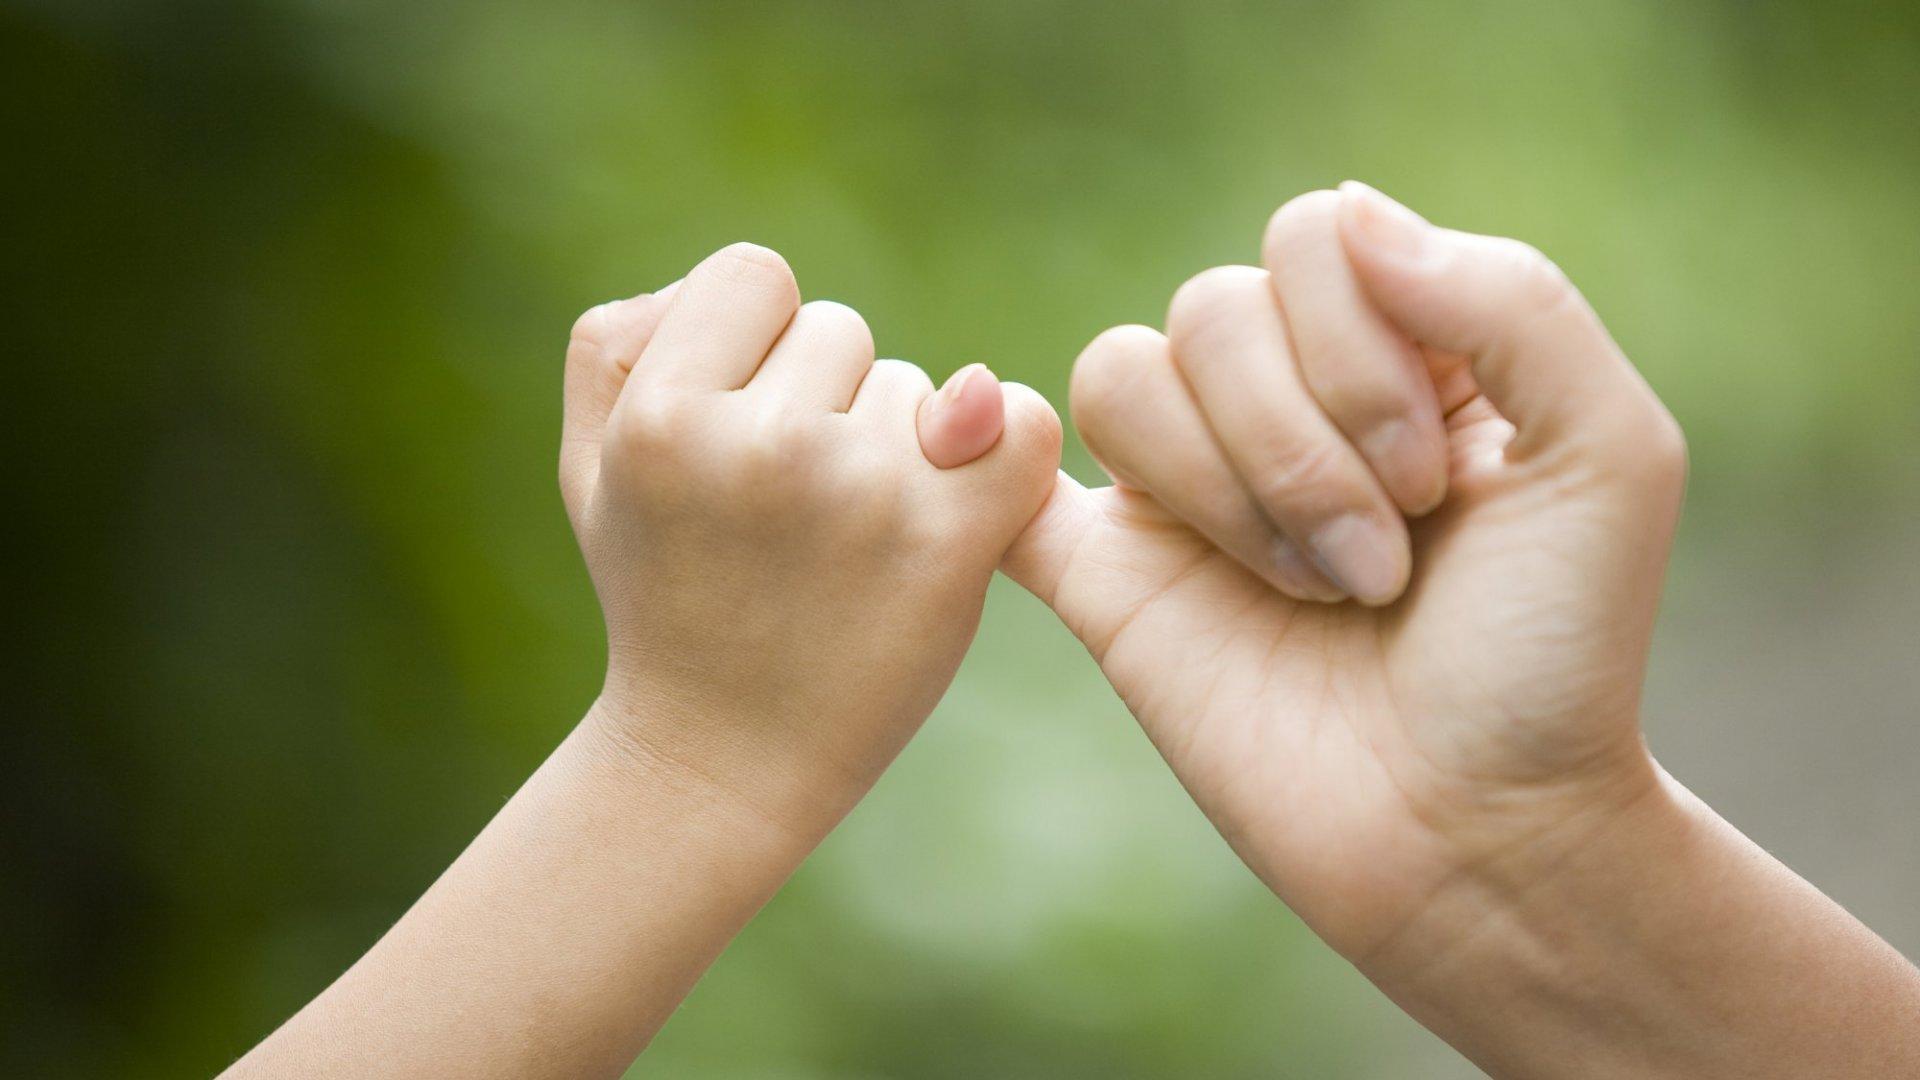 5 Ways to Tell if Someone Is Untrustworthy